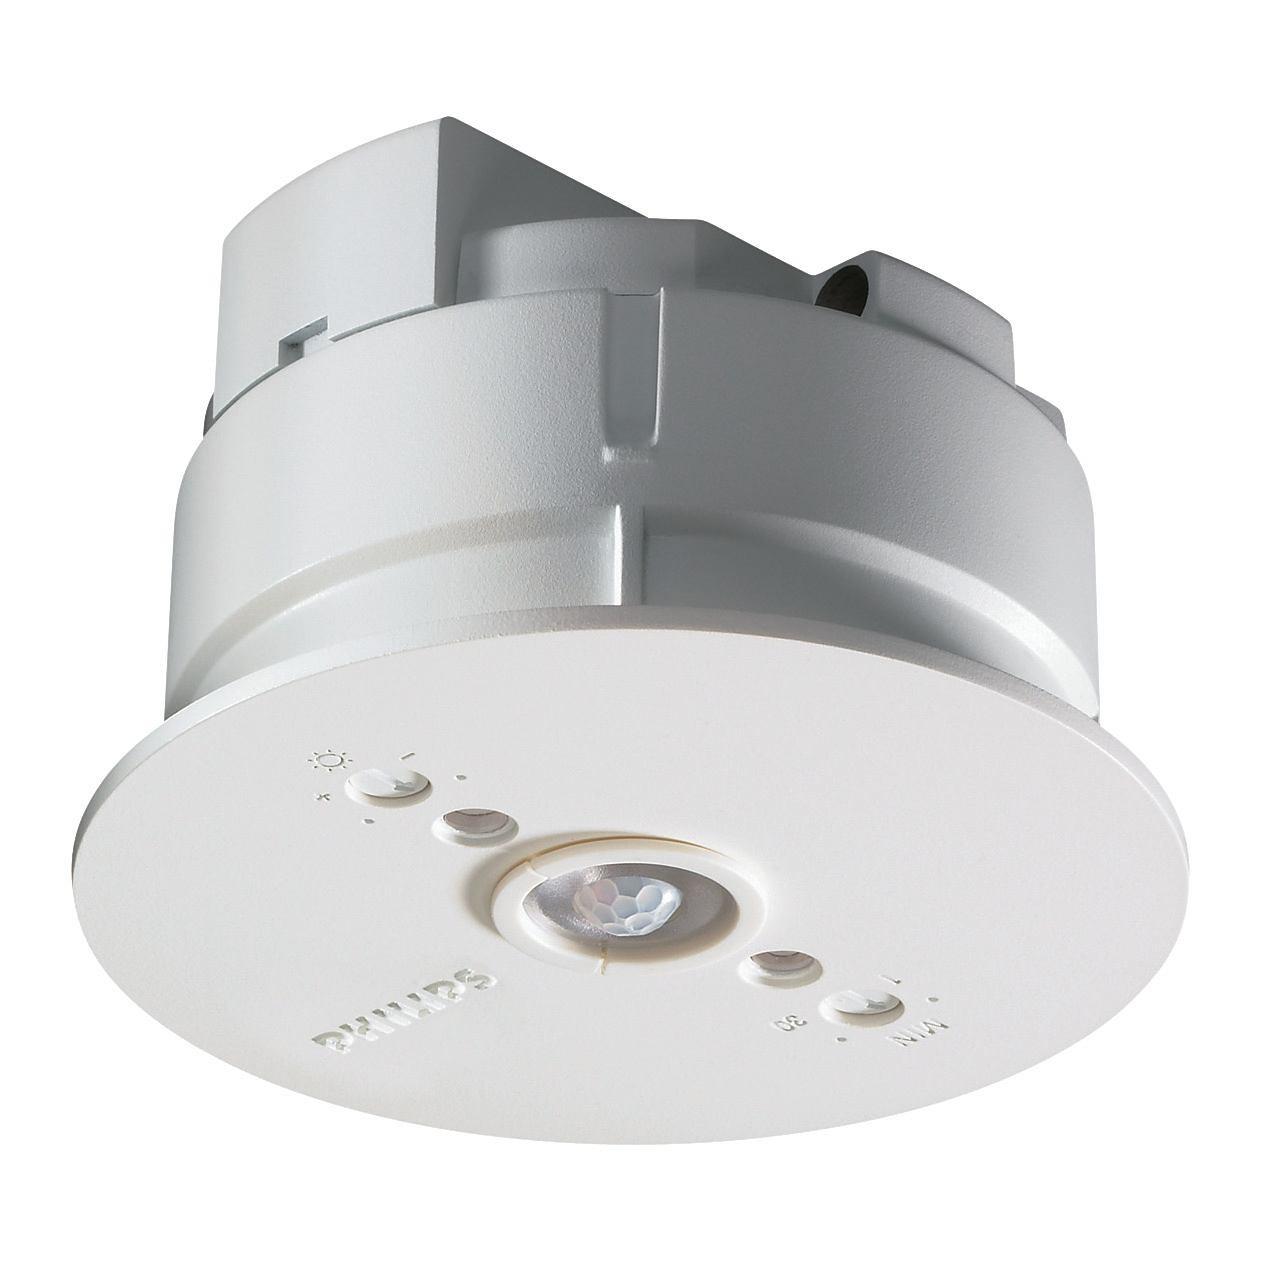 Philips Occuswitch Movement Sensor Switch Pir Lrm1070